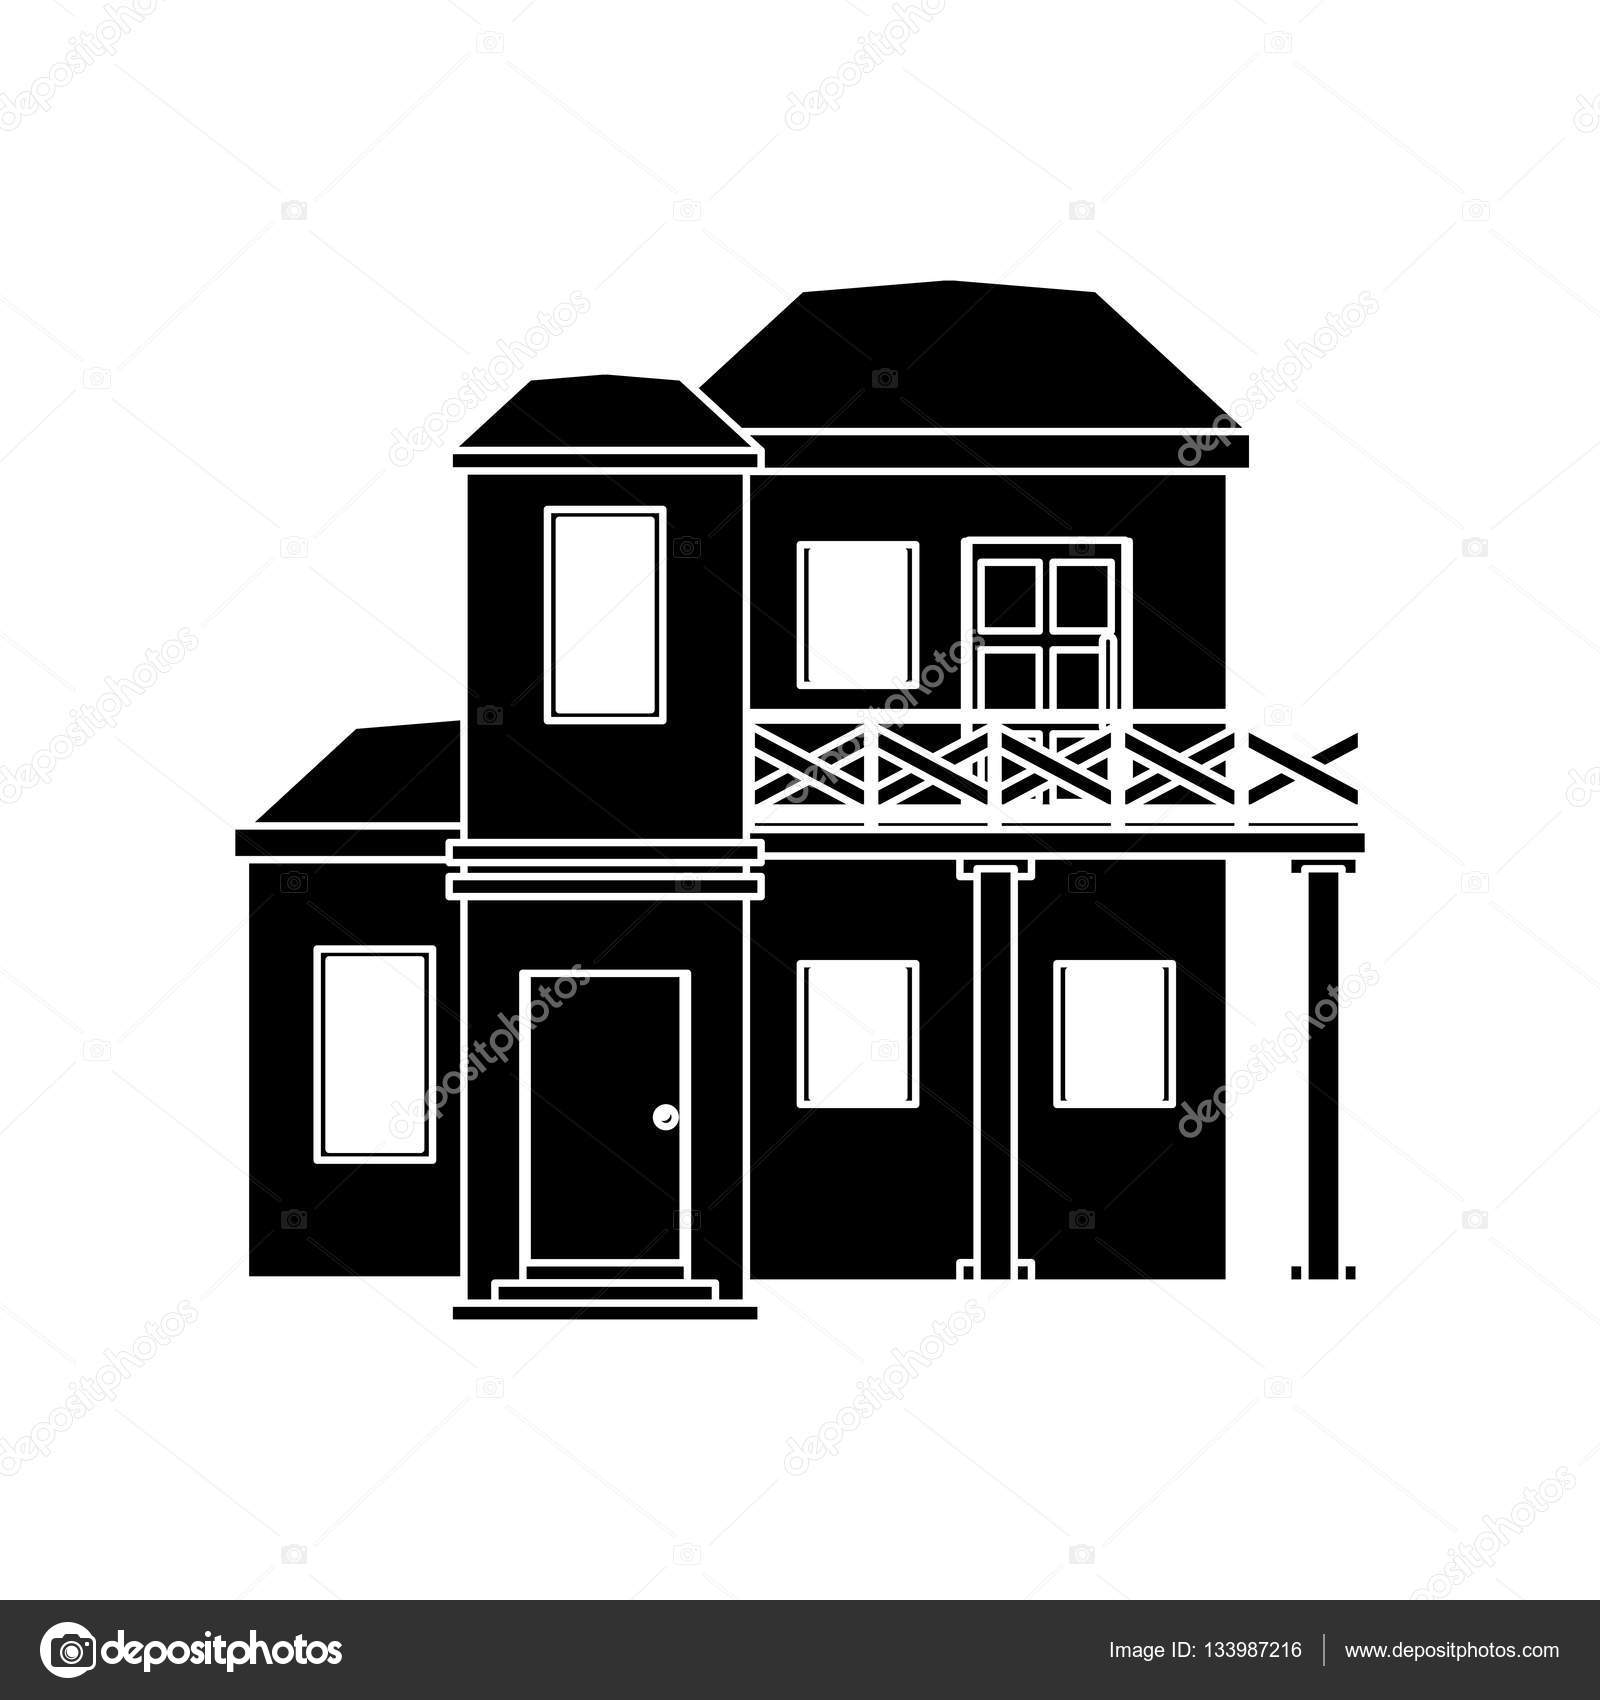 Piktogramm Haus Mit Balkon Dach Stockvektor C Jemastock 133987216